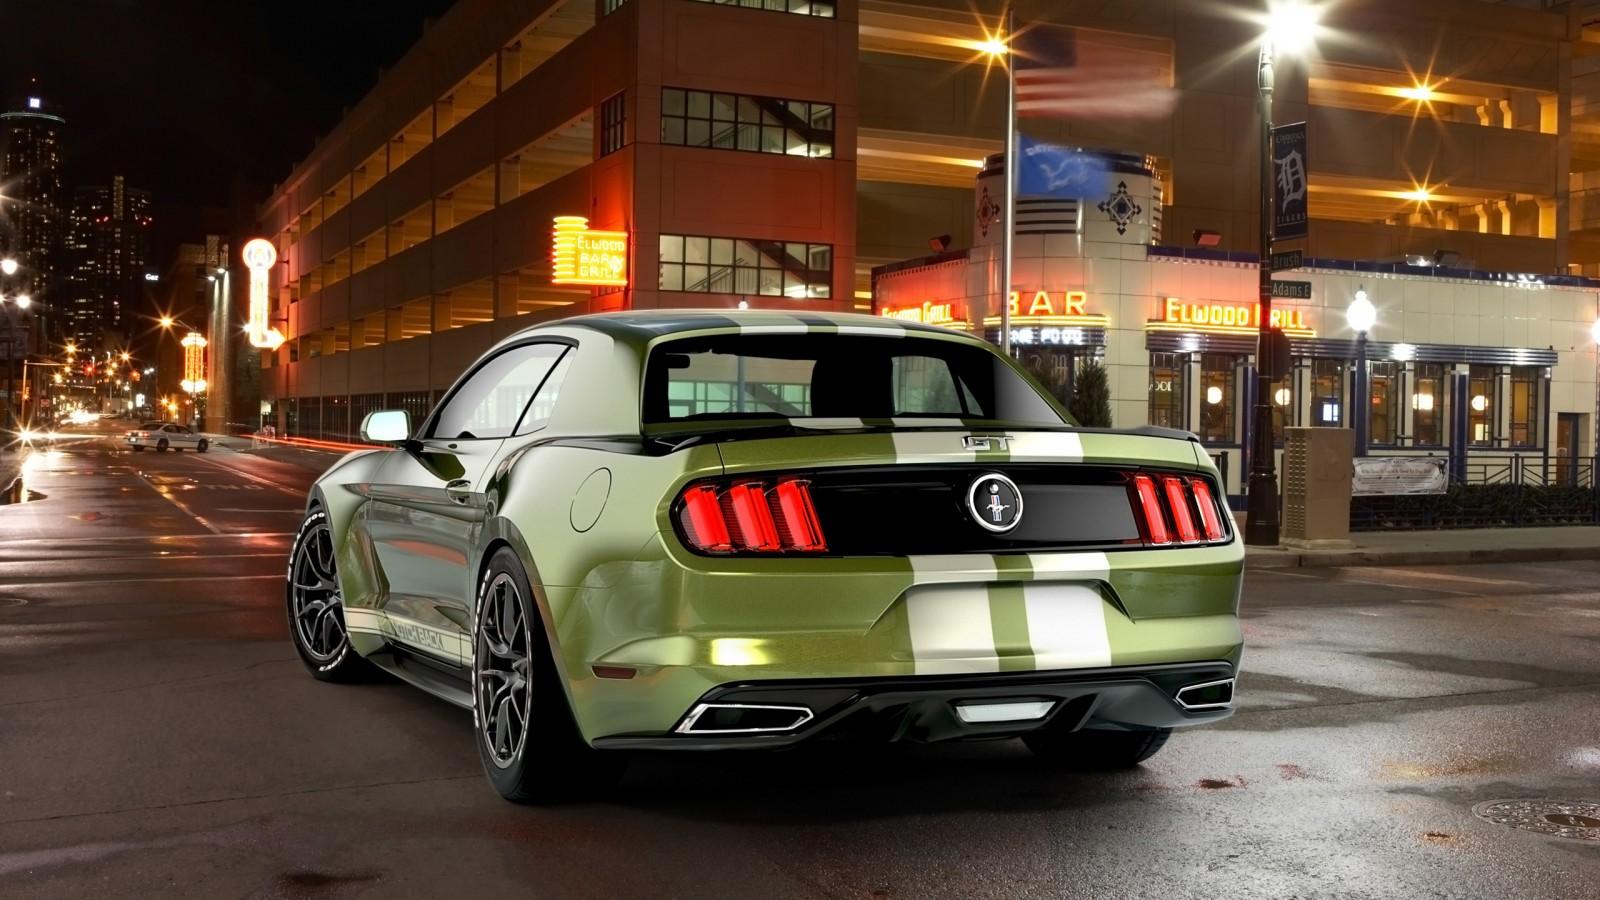 2017 Ford Mustang Notchback Design 2 Wallpaper